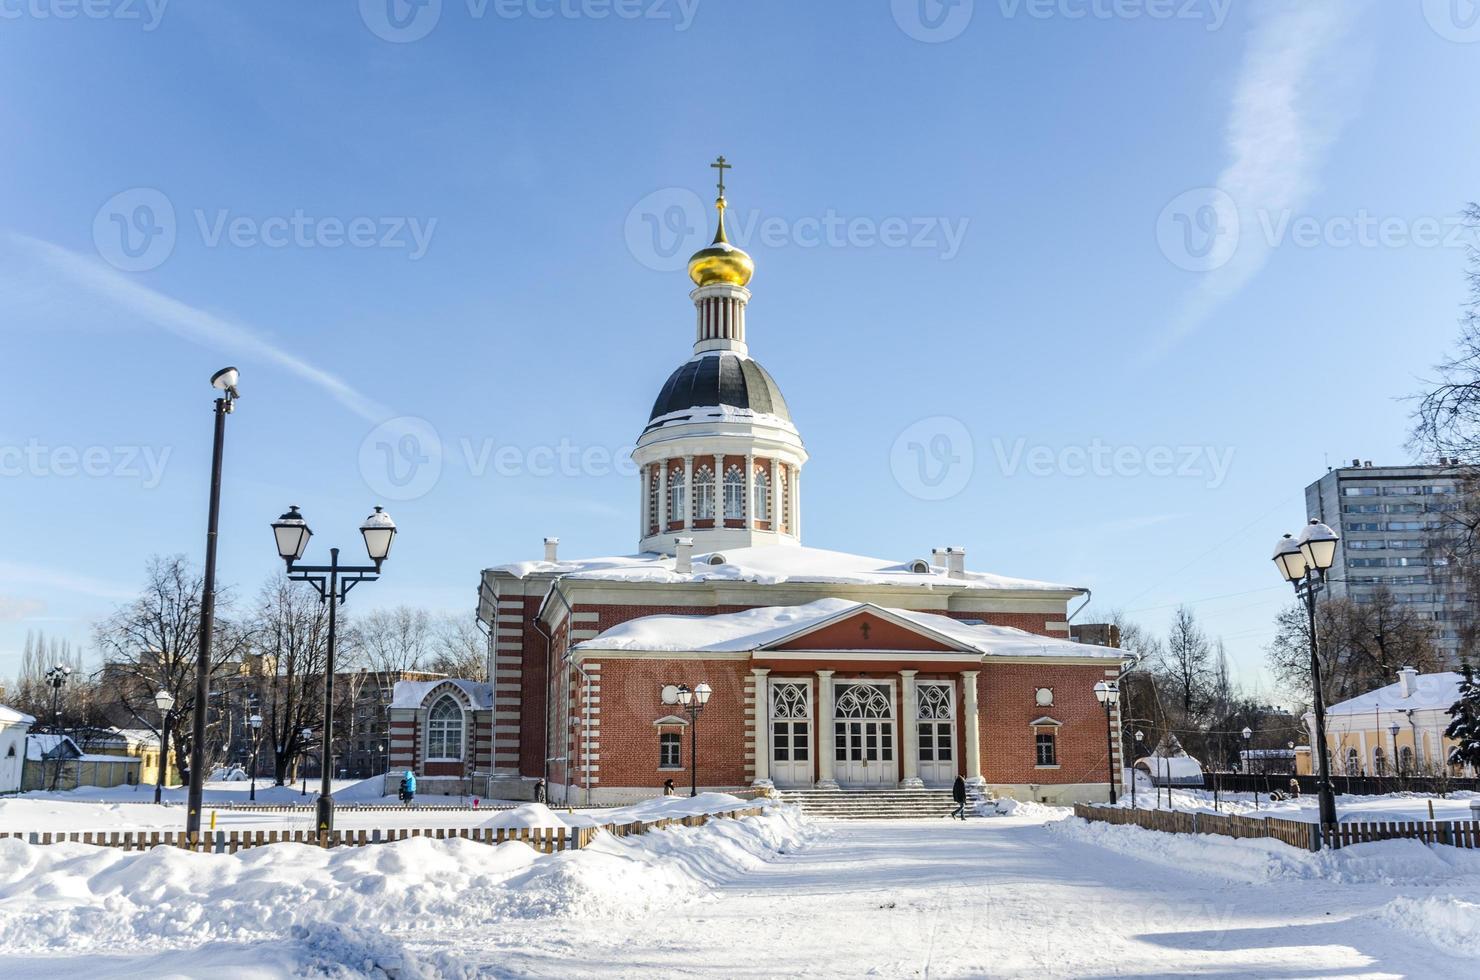 orthodoxe Kirche in Moskau, Russland Winter, foto